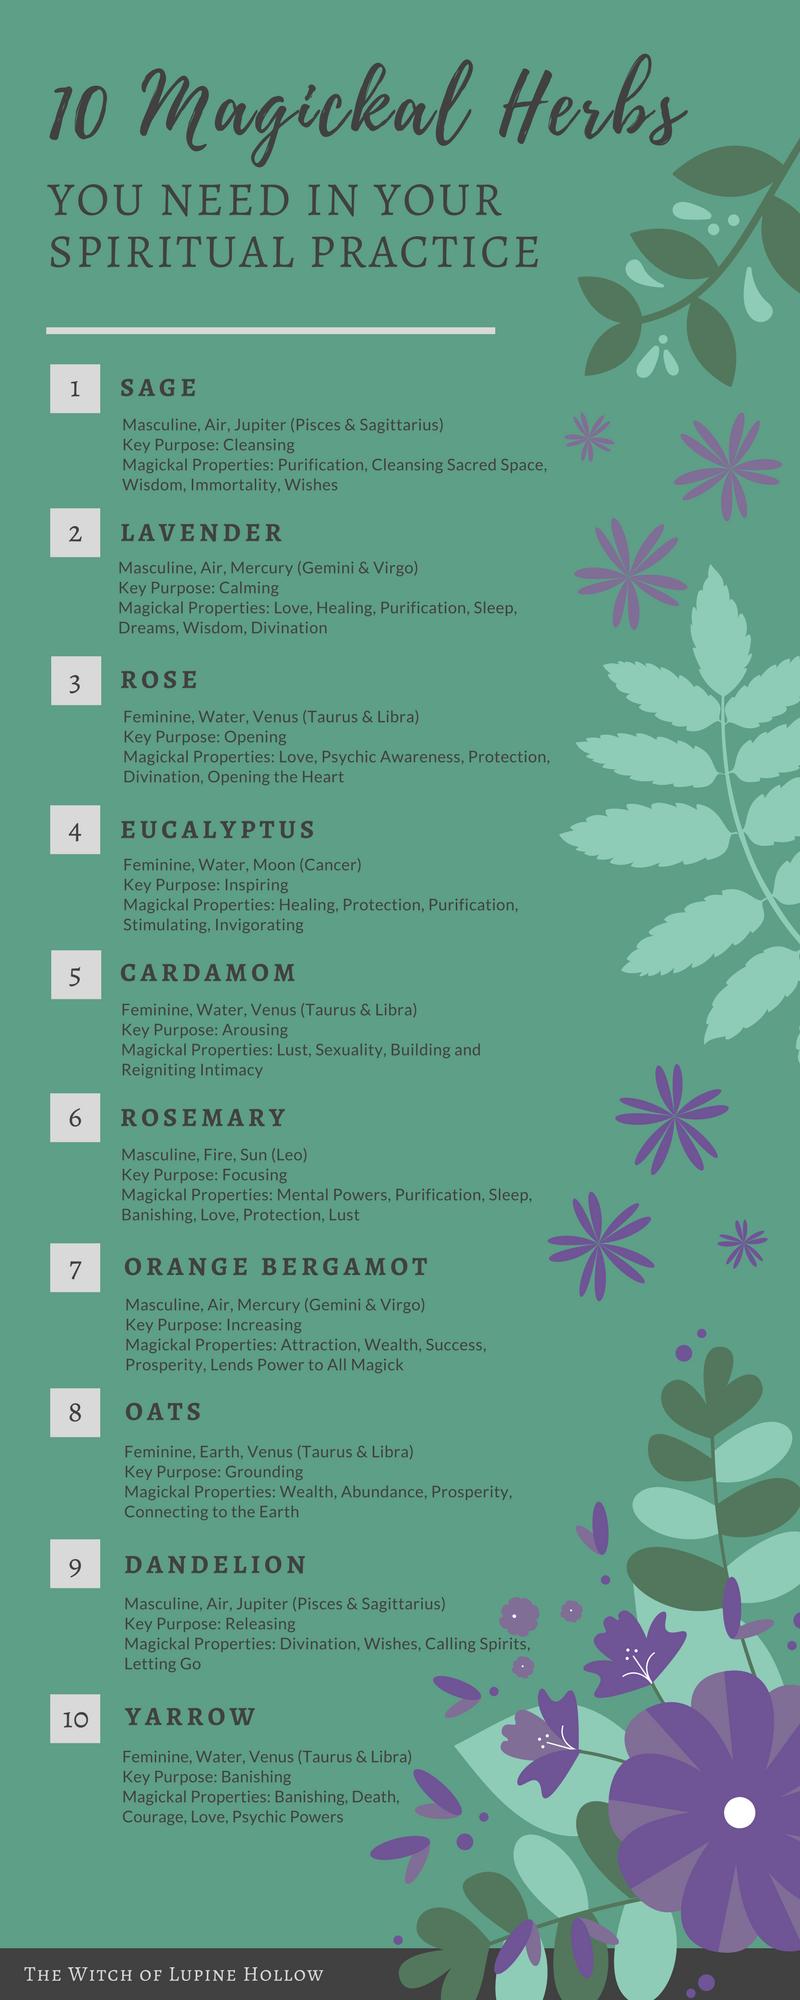 10 Magickal Herbs You Need in Your Spiritual Practice | Herbal ...